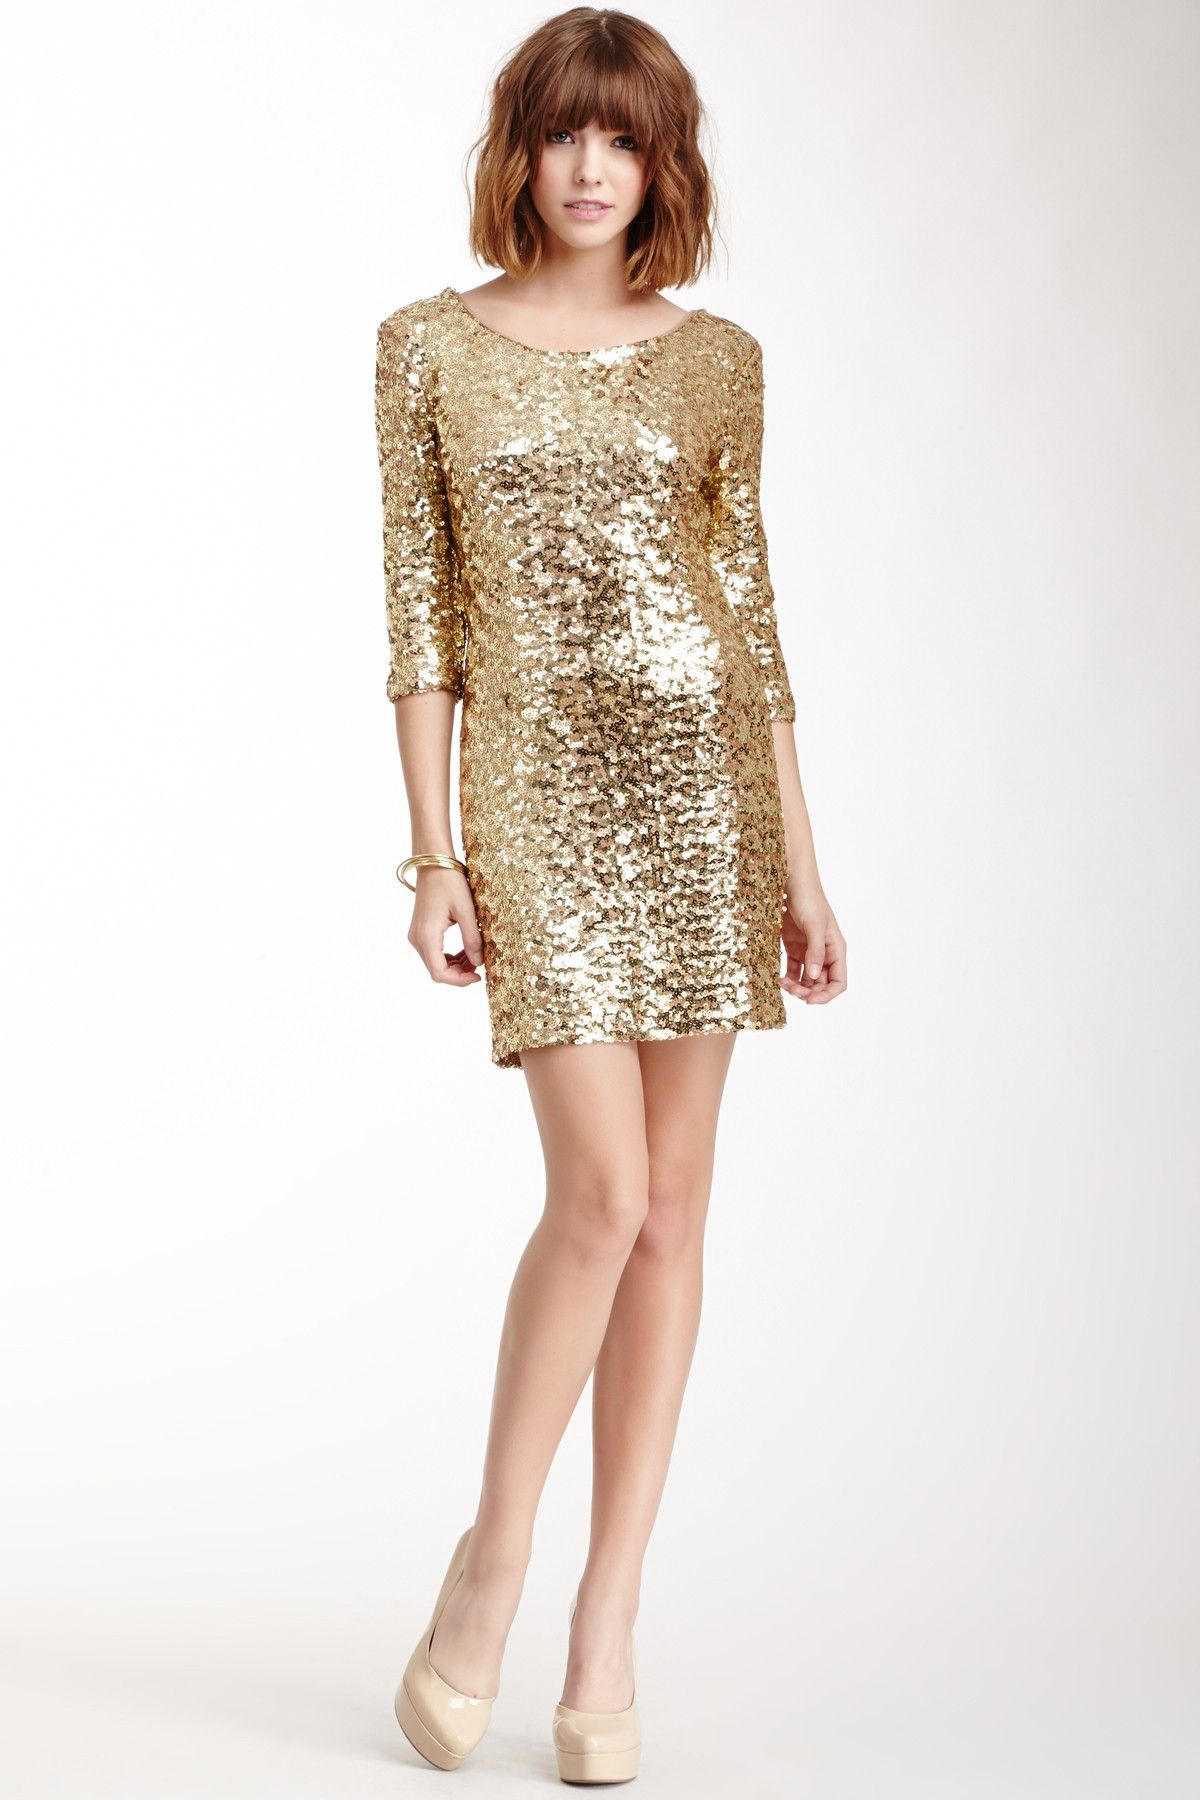 Gold sparkle wedding dress  BB Dakota Neva Sequin Dress on HauteLook  The Hair u The Dress